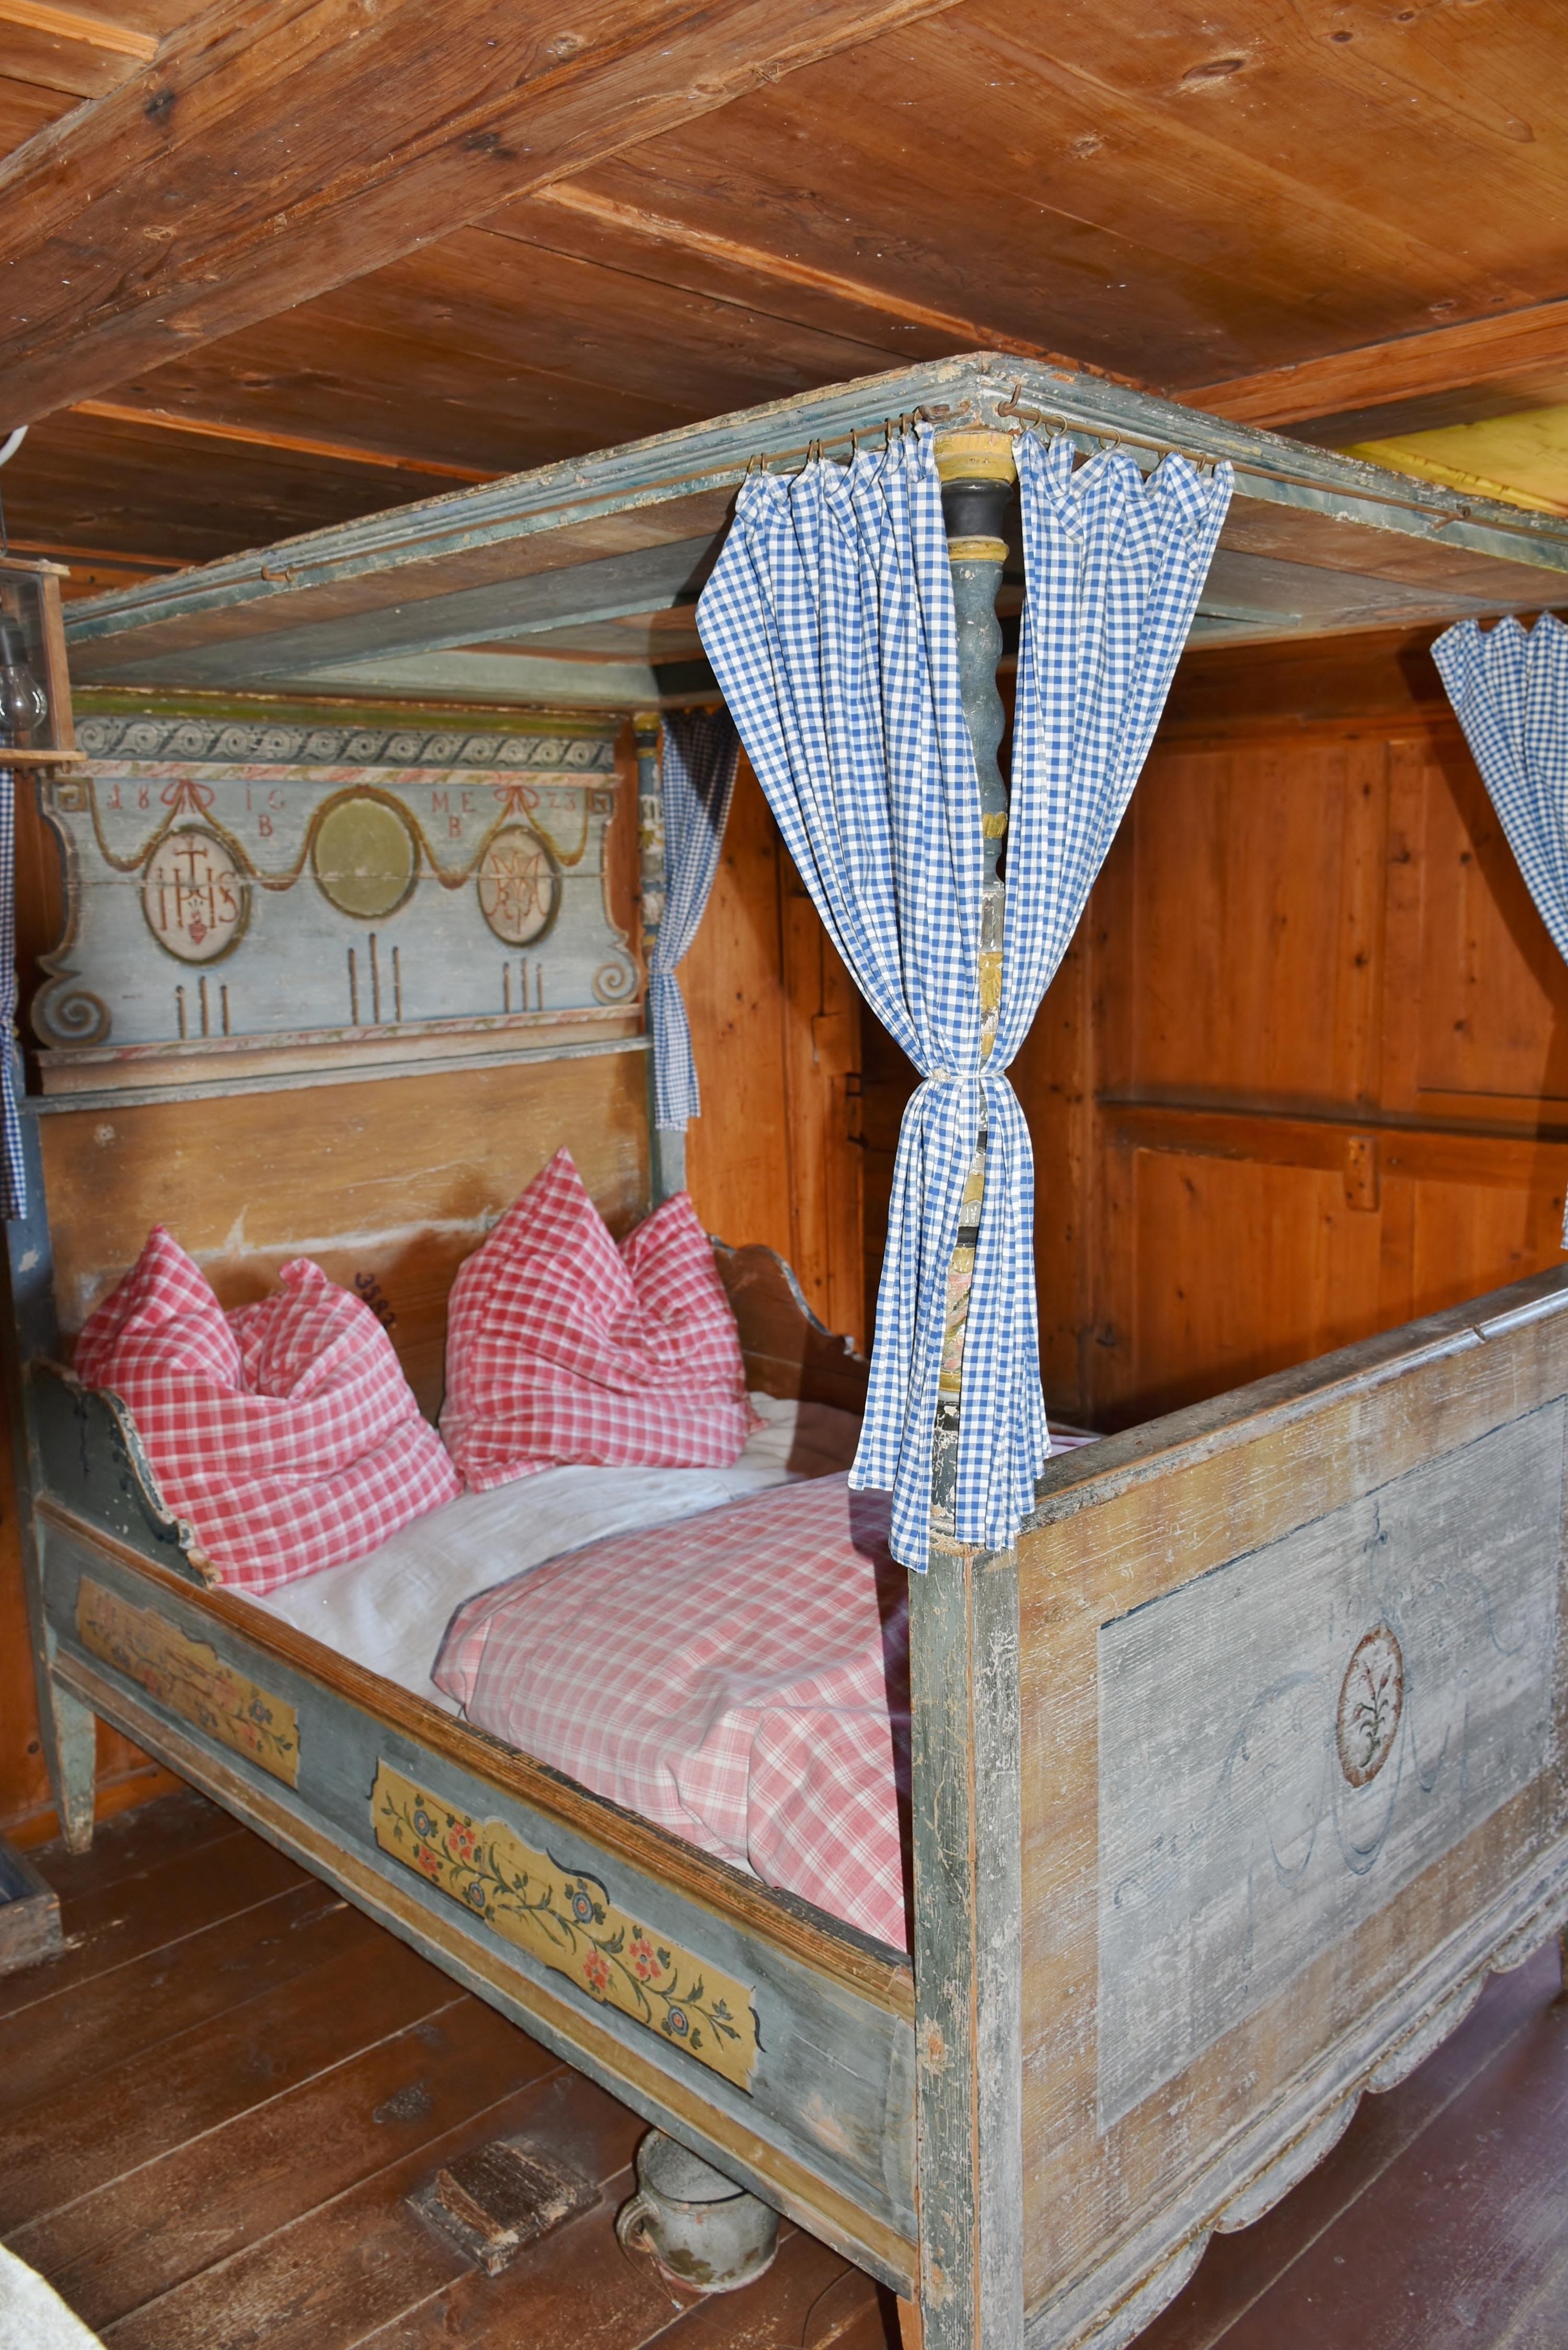 Fotos Gratis Mesa Madera Granja Antiguo Rural Arte Mueble  # Muebles Historicos